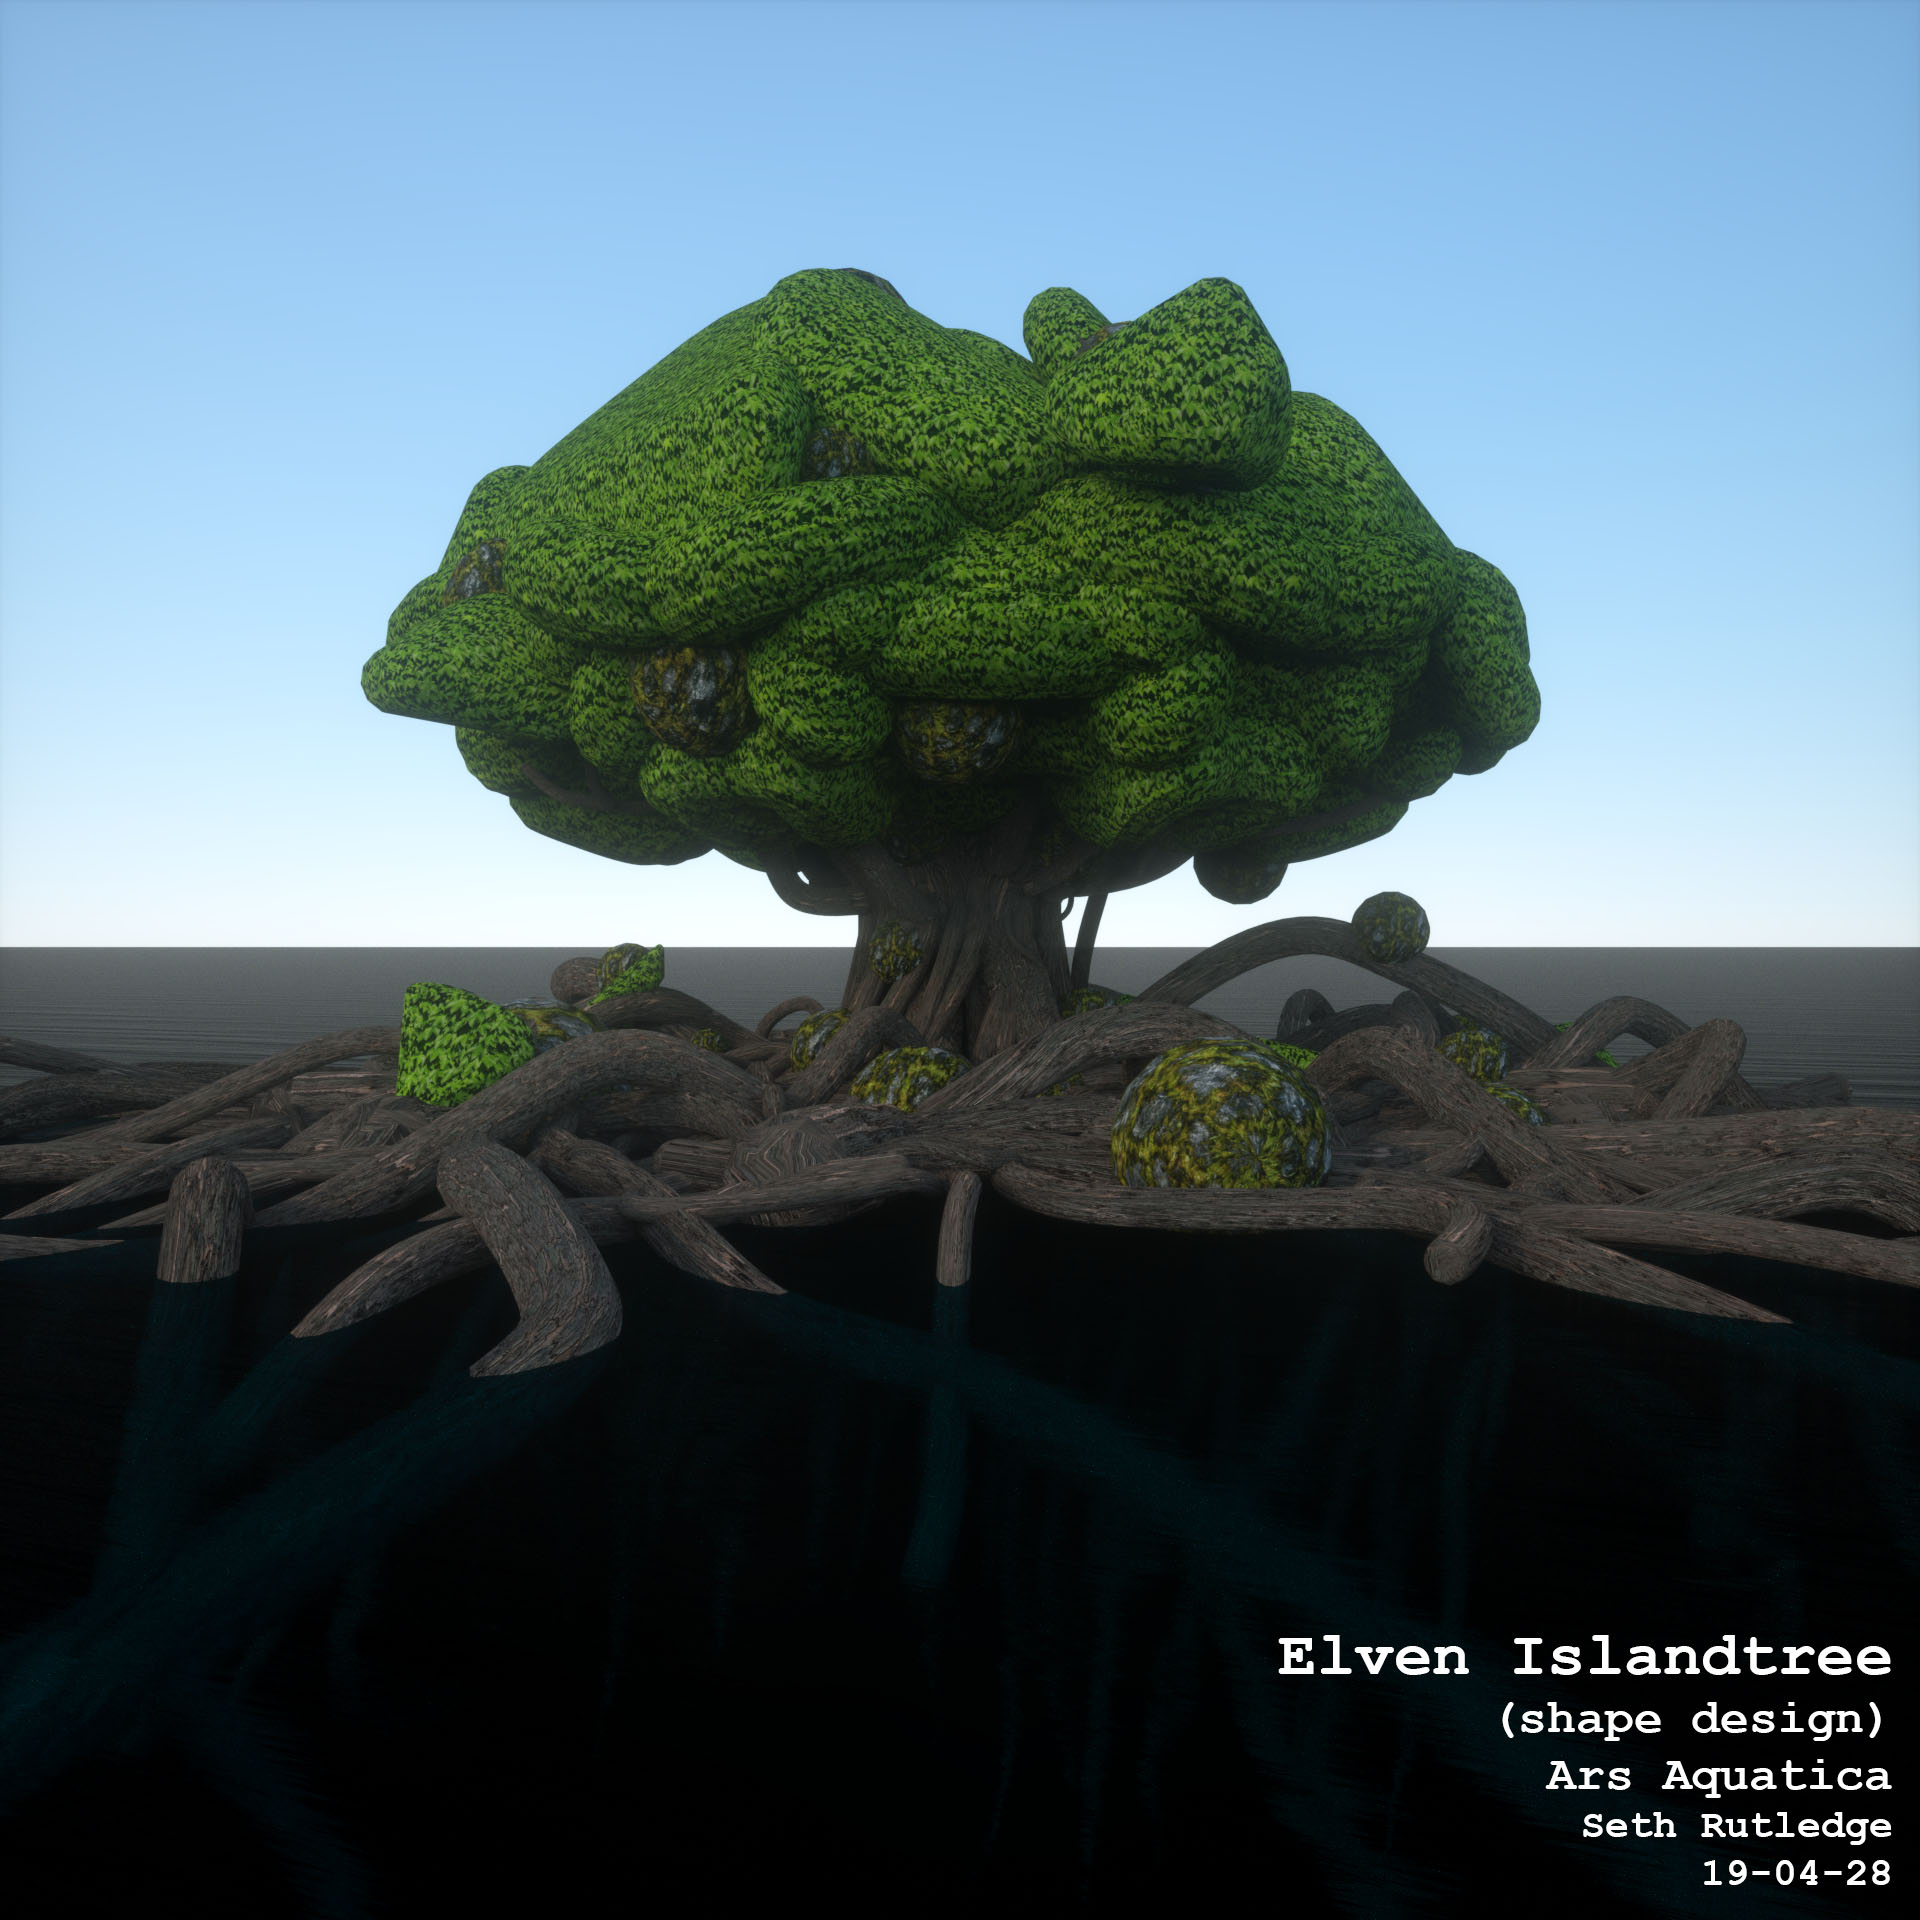 Elf_Islandtree1.jpg